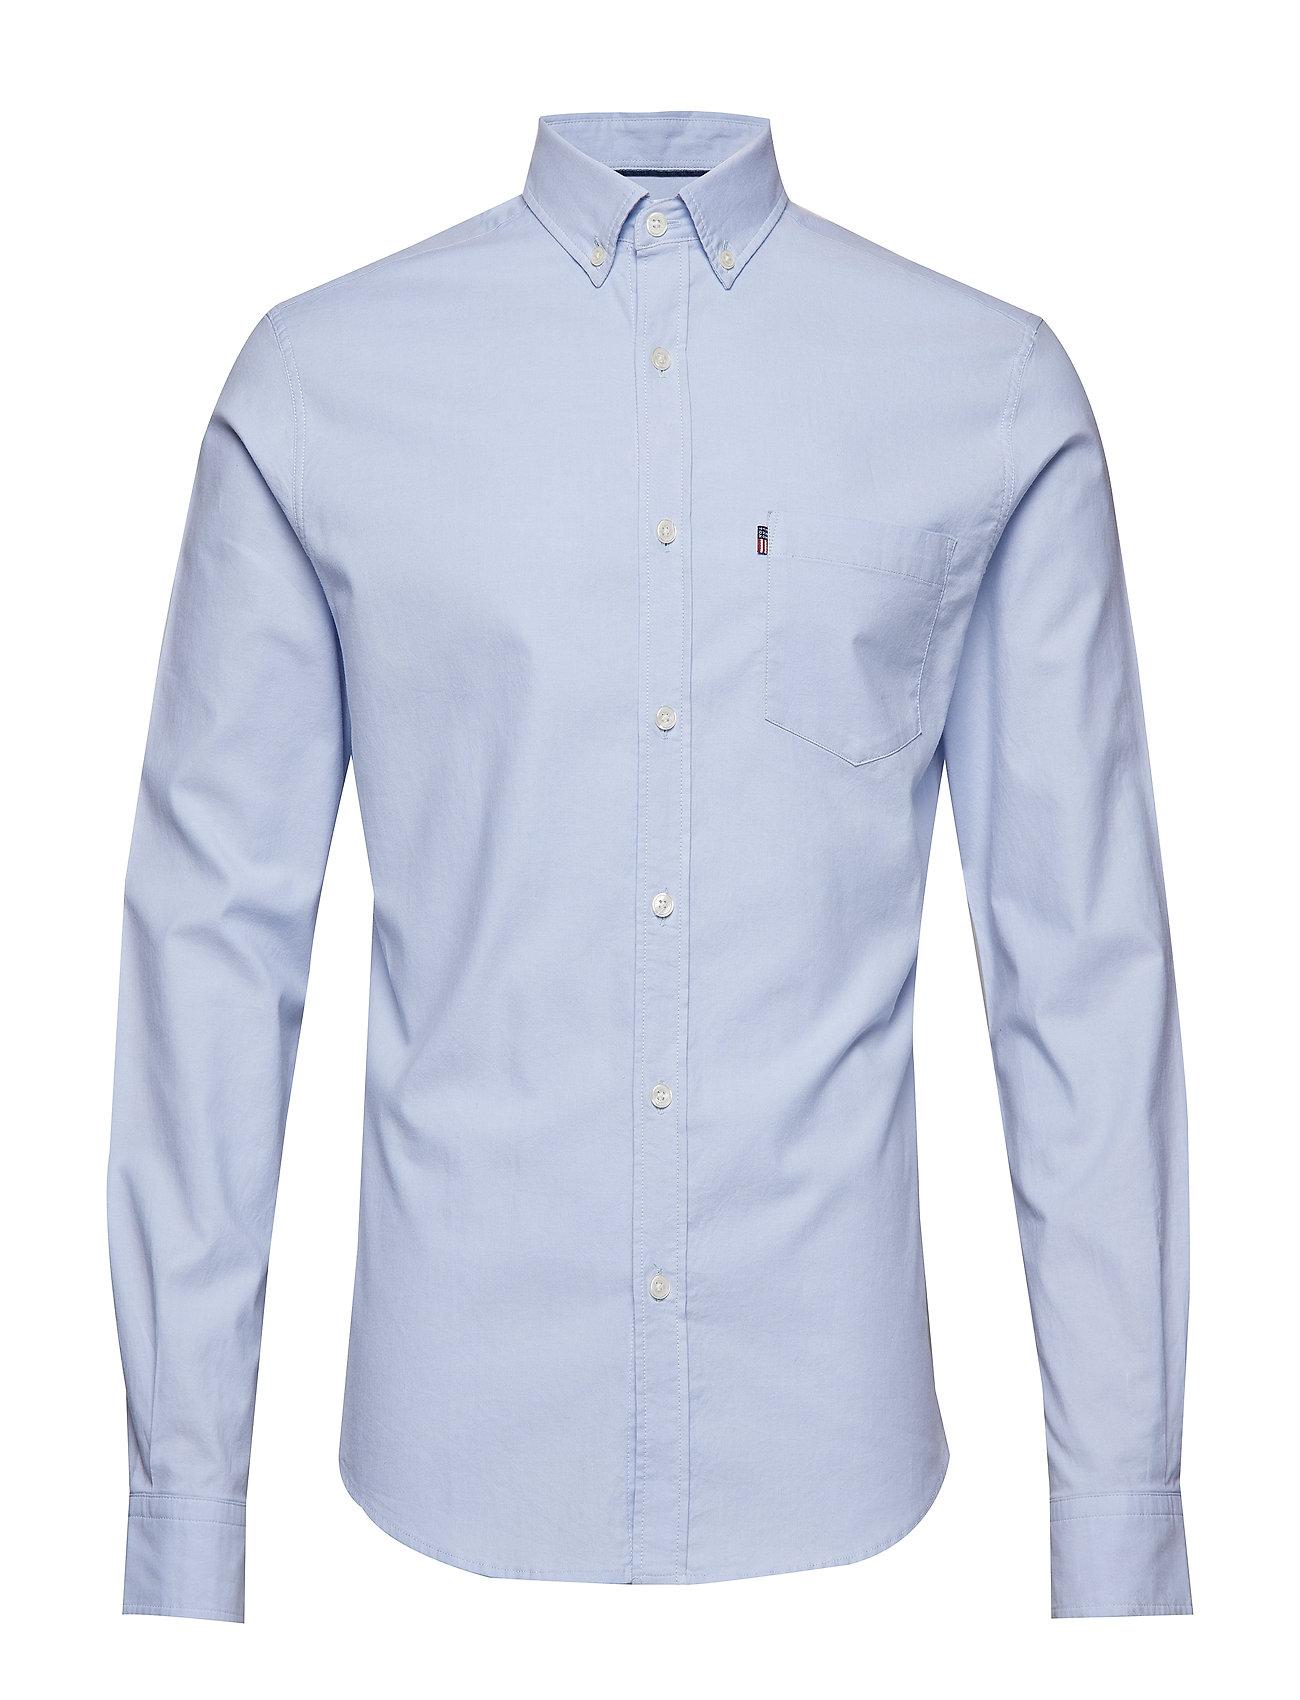 Marc Shirtlight Oxford BlueLexington Clothing Stretch MVpzqUGS